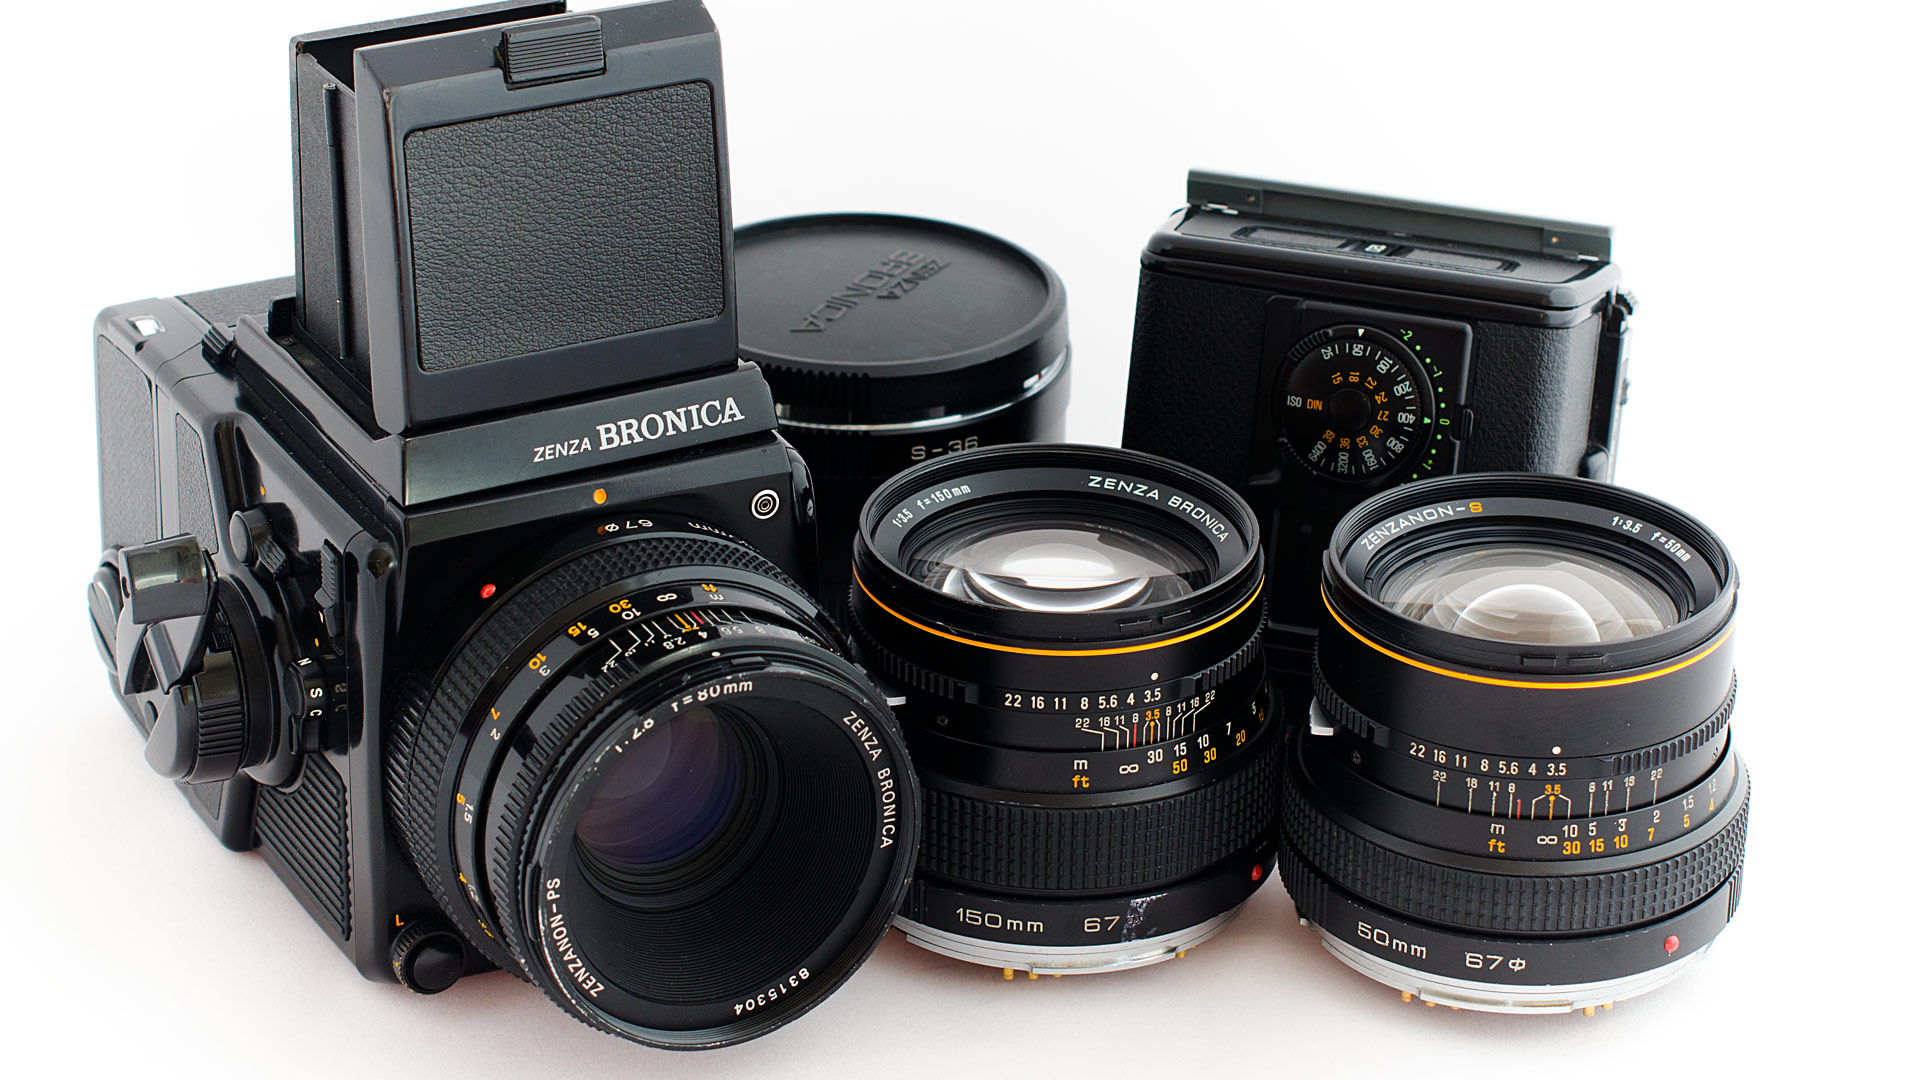 005_DSC9168-zenza-BRONICA-6X6---80mm2,8---50mm3,5---150mm3,5-mezikrouºky-S36-náhr-film-kazeta